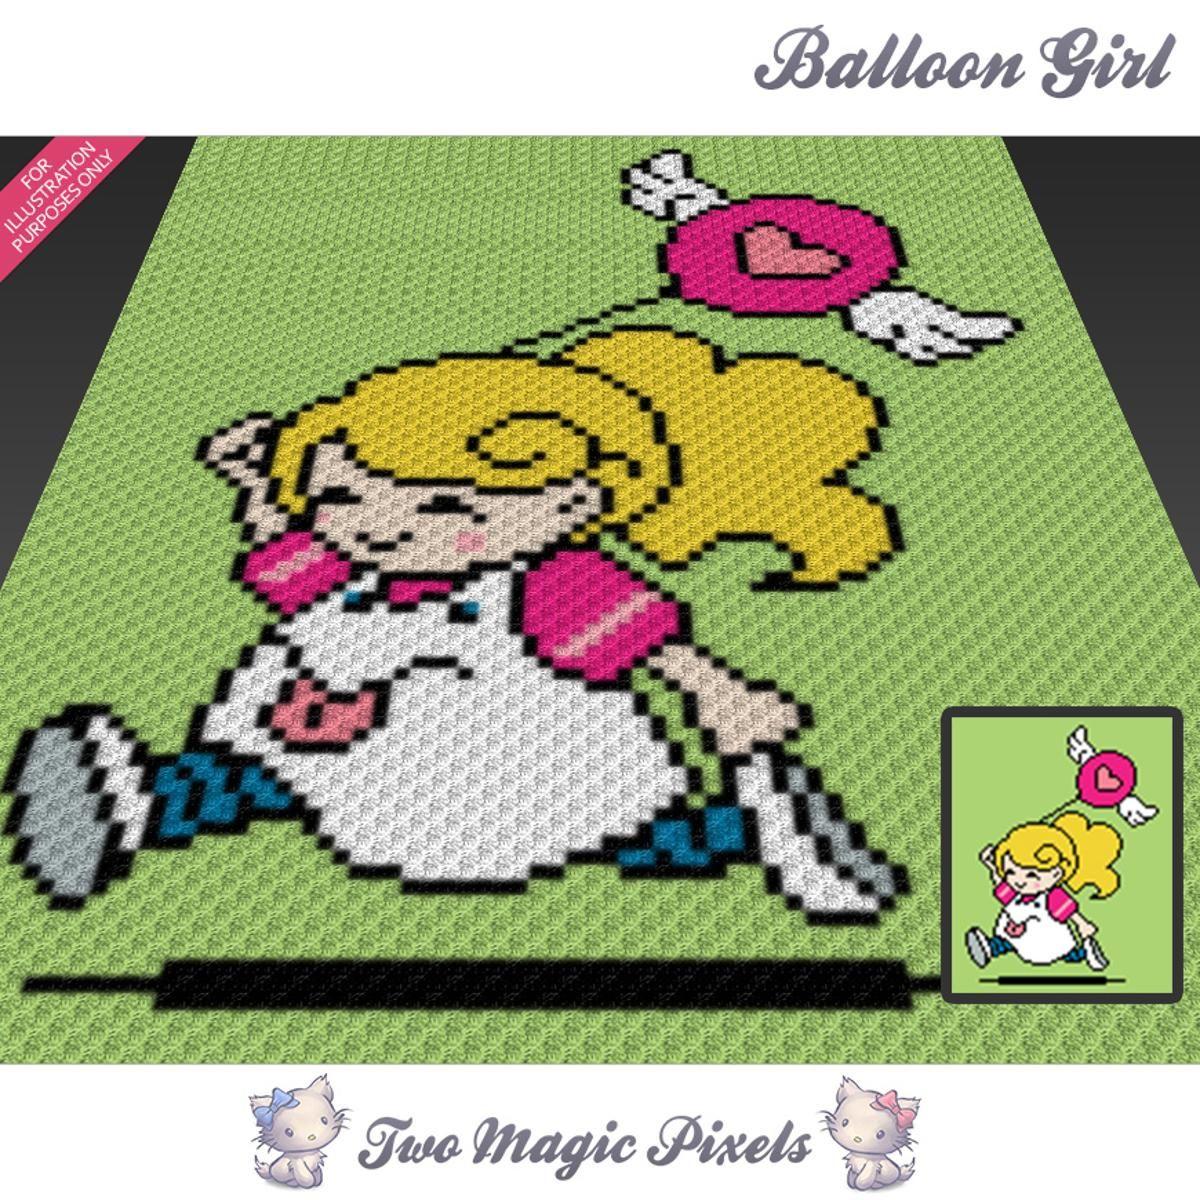 Balloon Girl (sc tss c2c cross stitch)